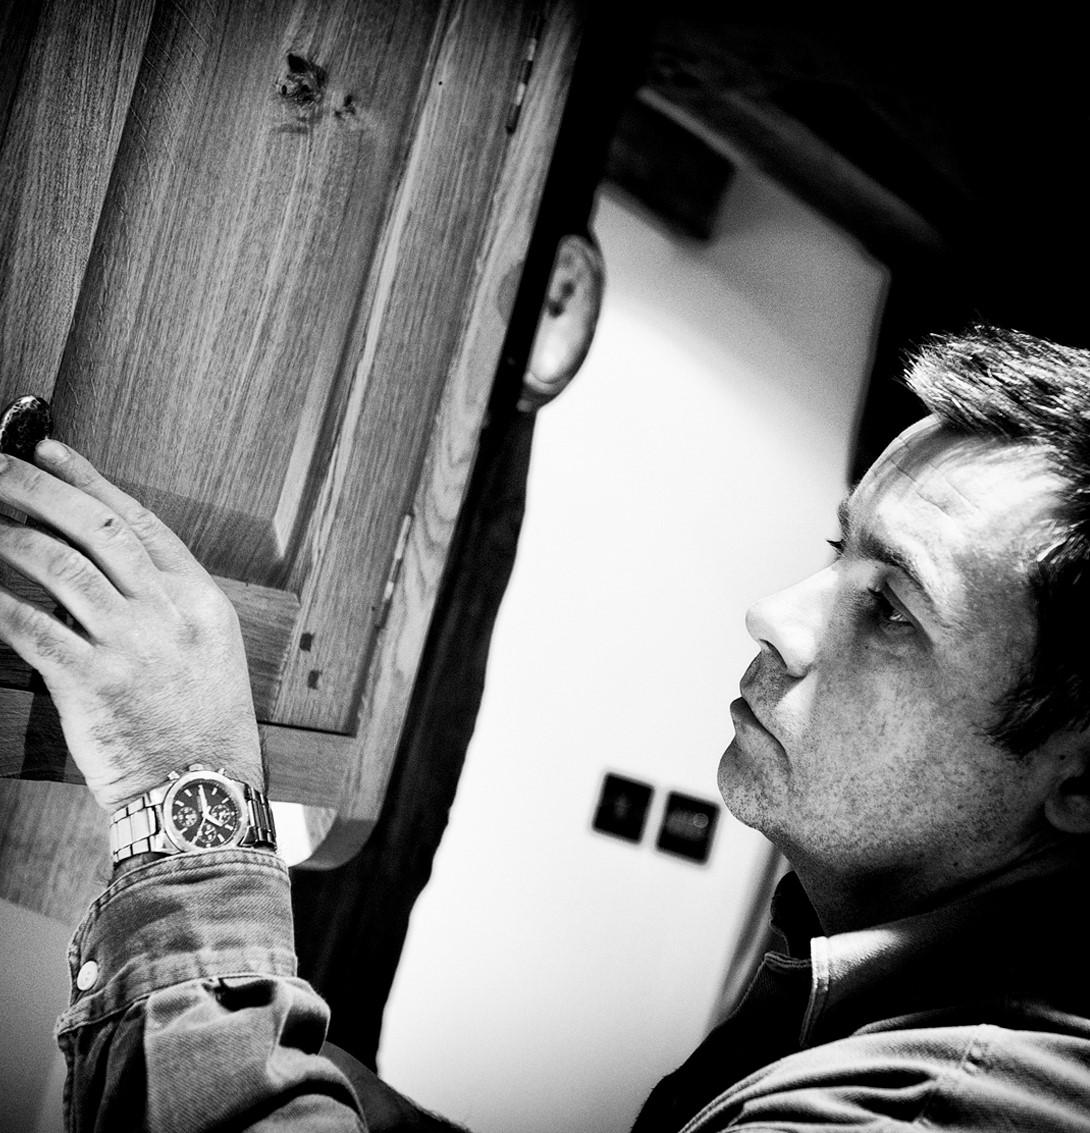 Bruno Boulay bespoke joinery